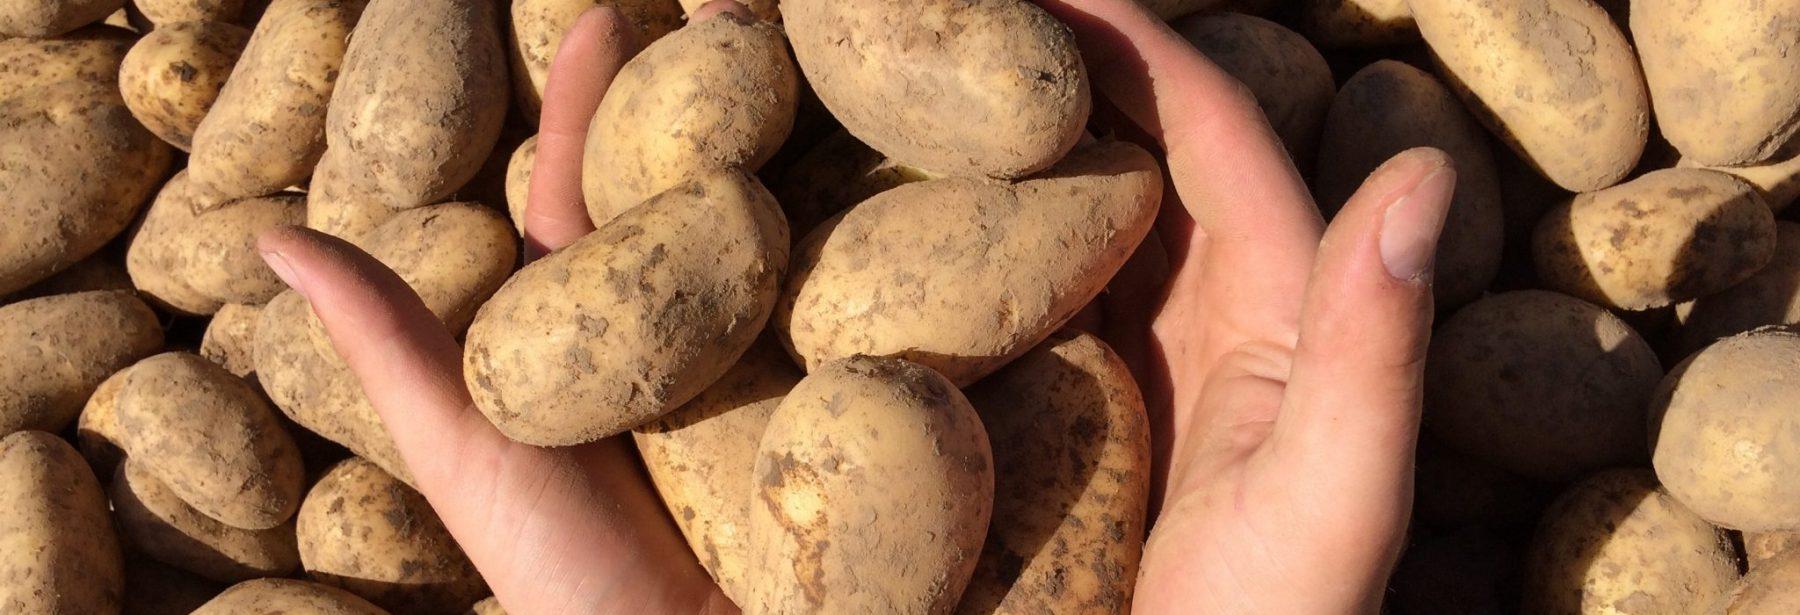 Rothkopf Eifel-Gemüse